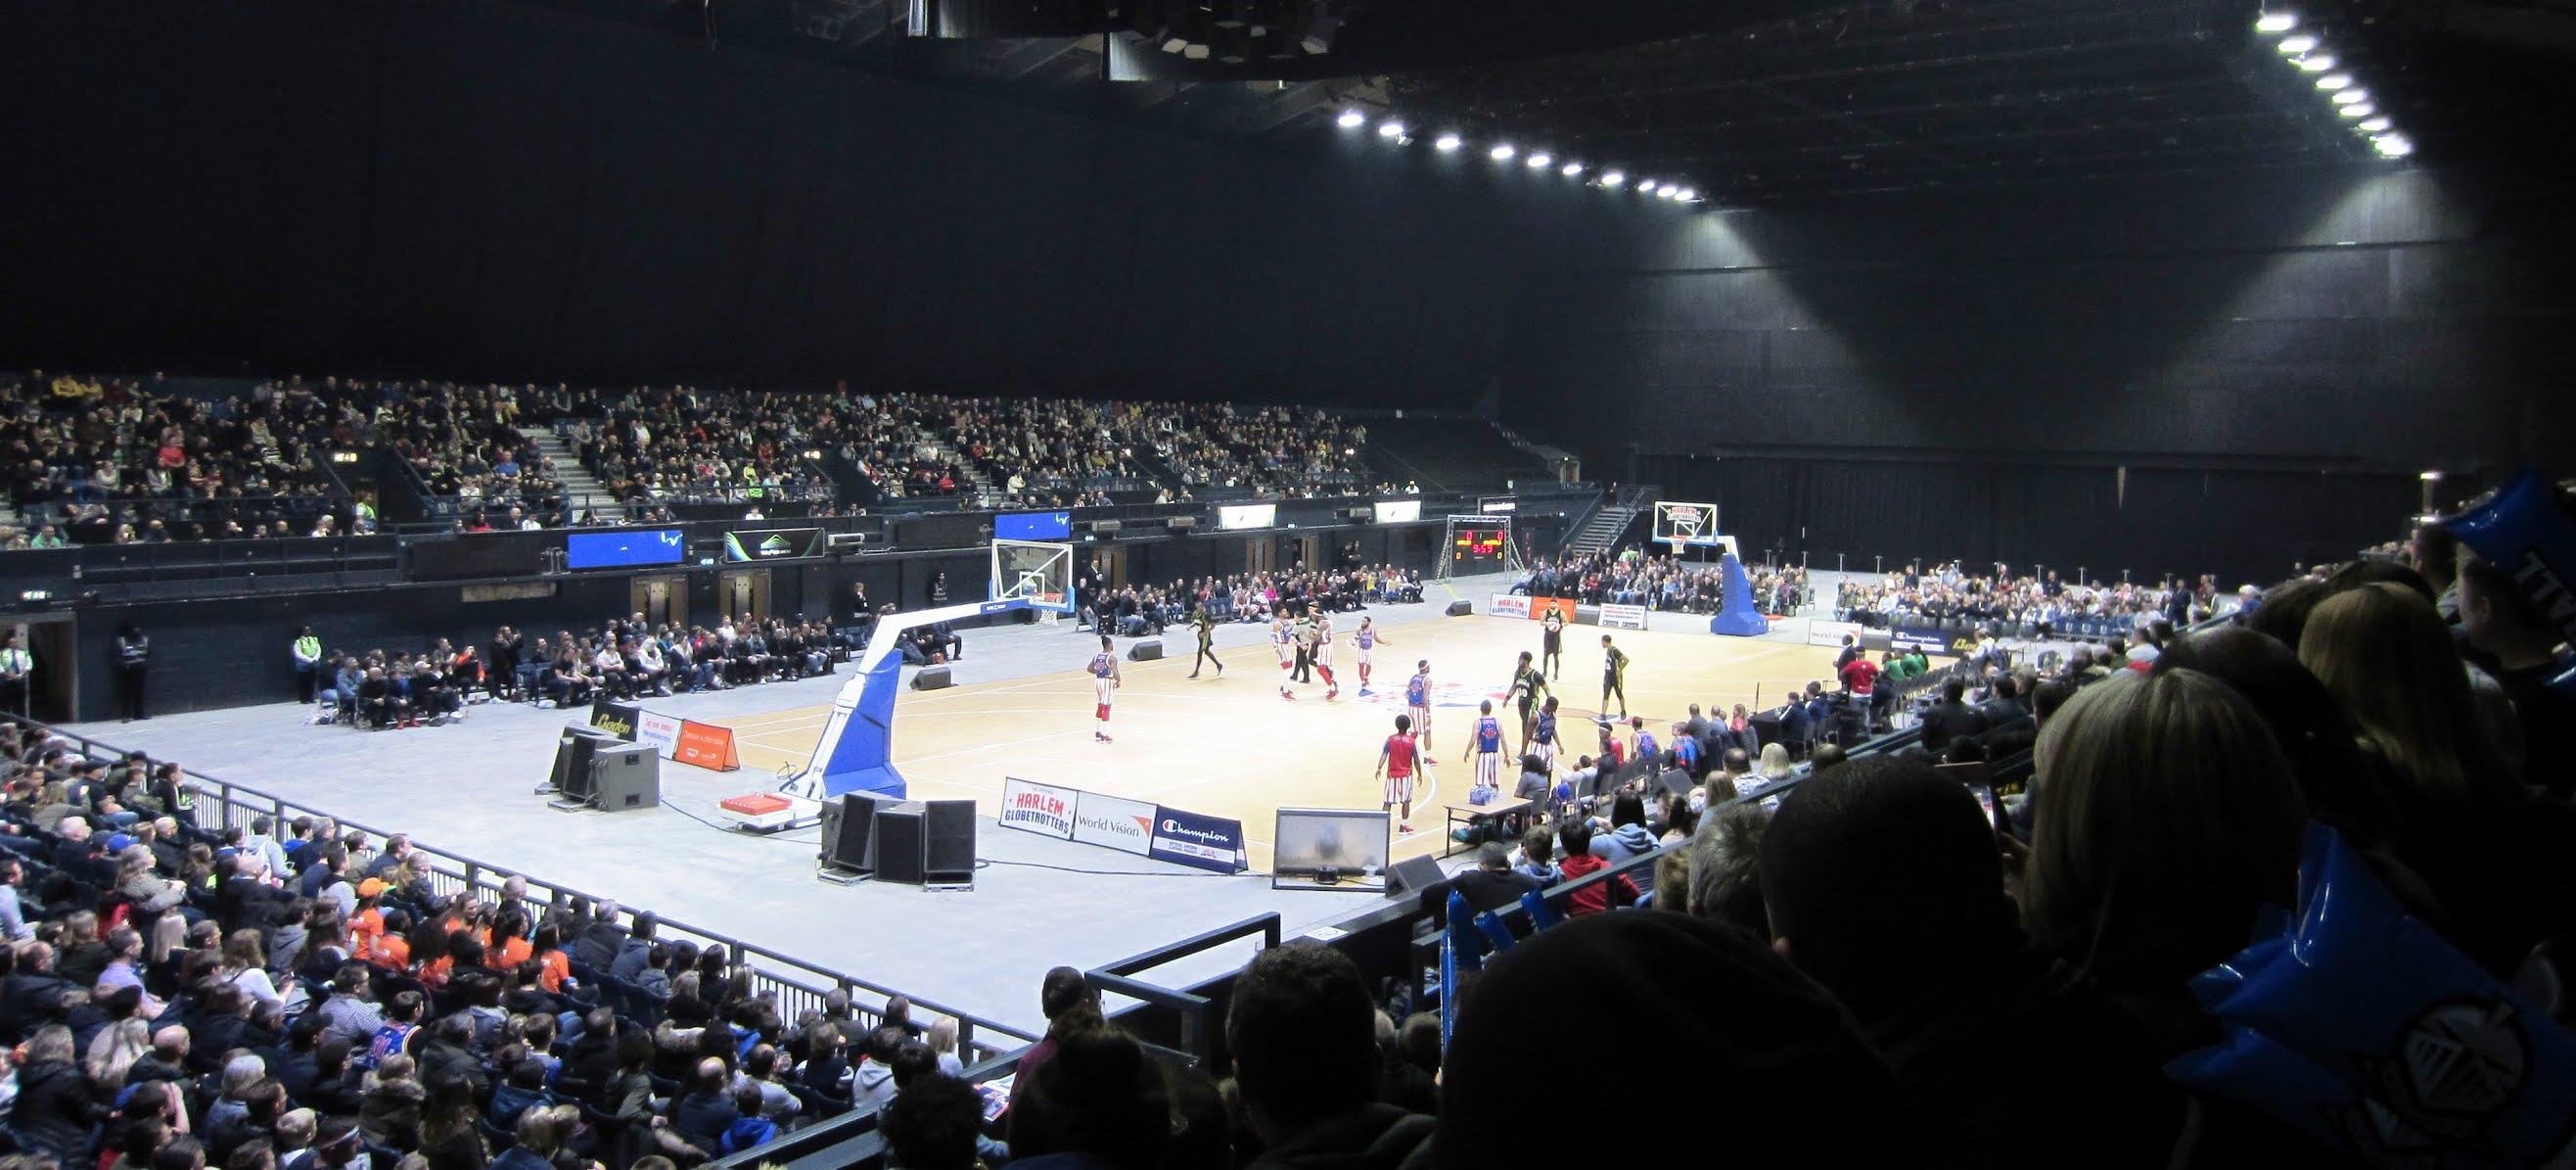 Harlem Globetrotters taking on the Washington Generals at The SSE Arena Wembley